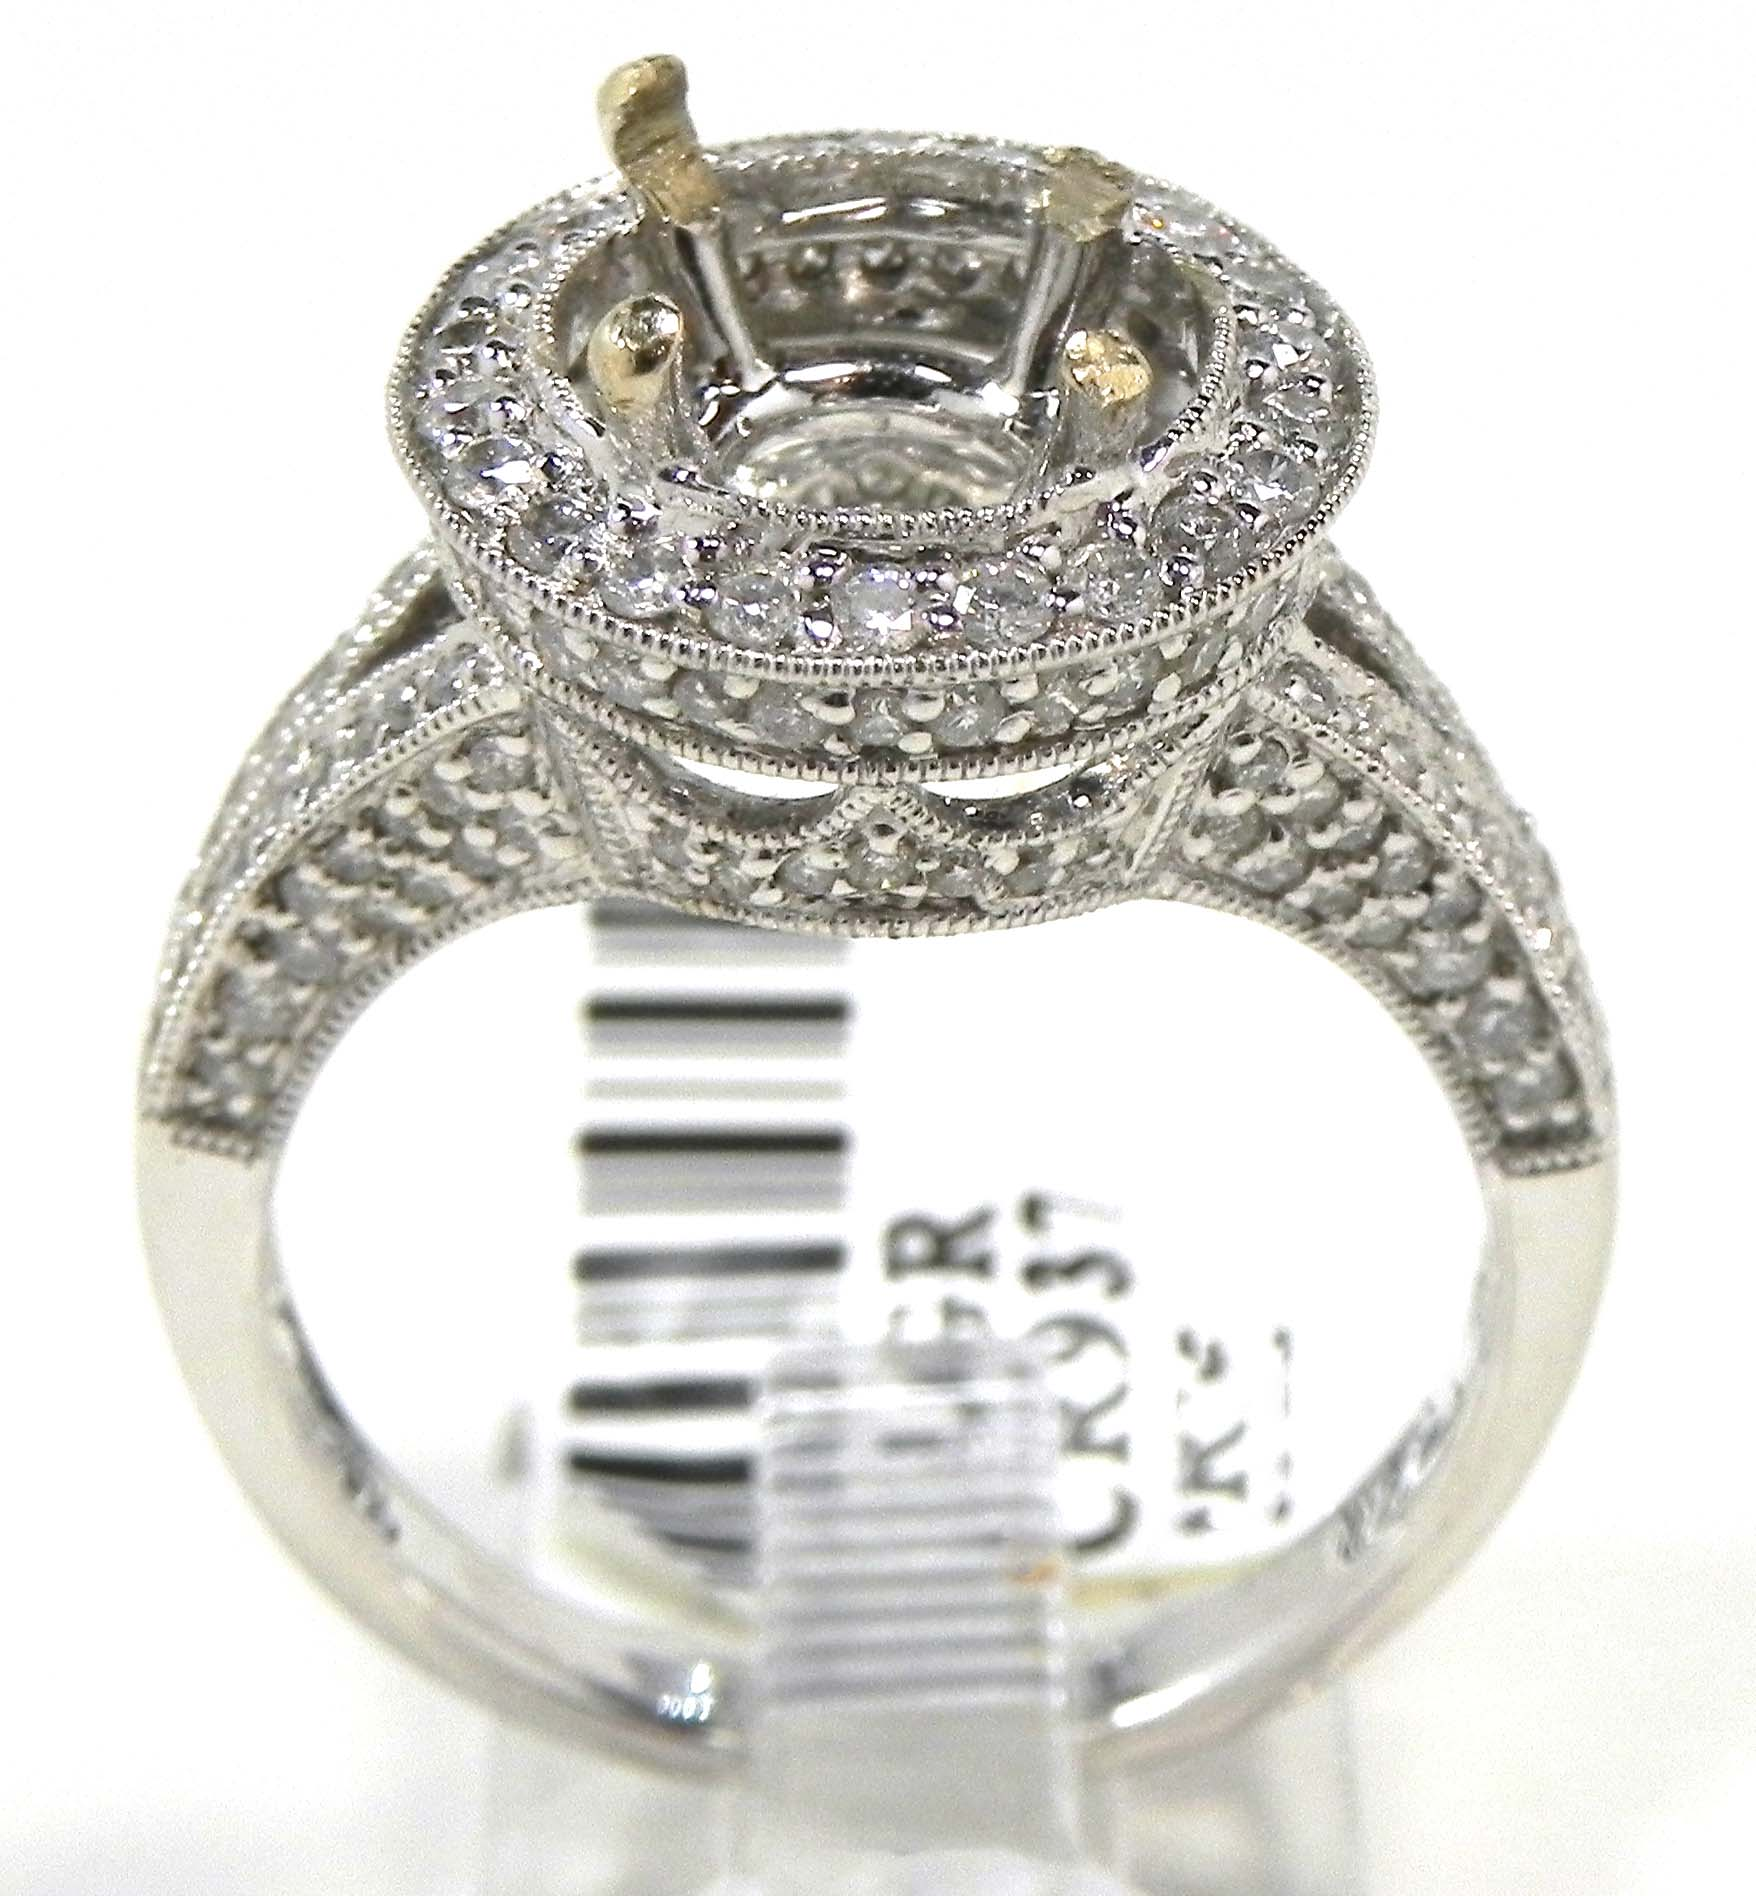 La s 18k White Gold Diamonds Circle Semi Mount Engagement Ring